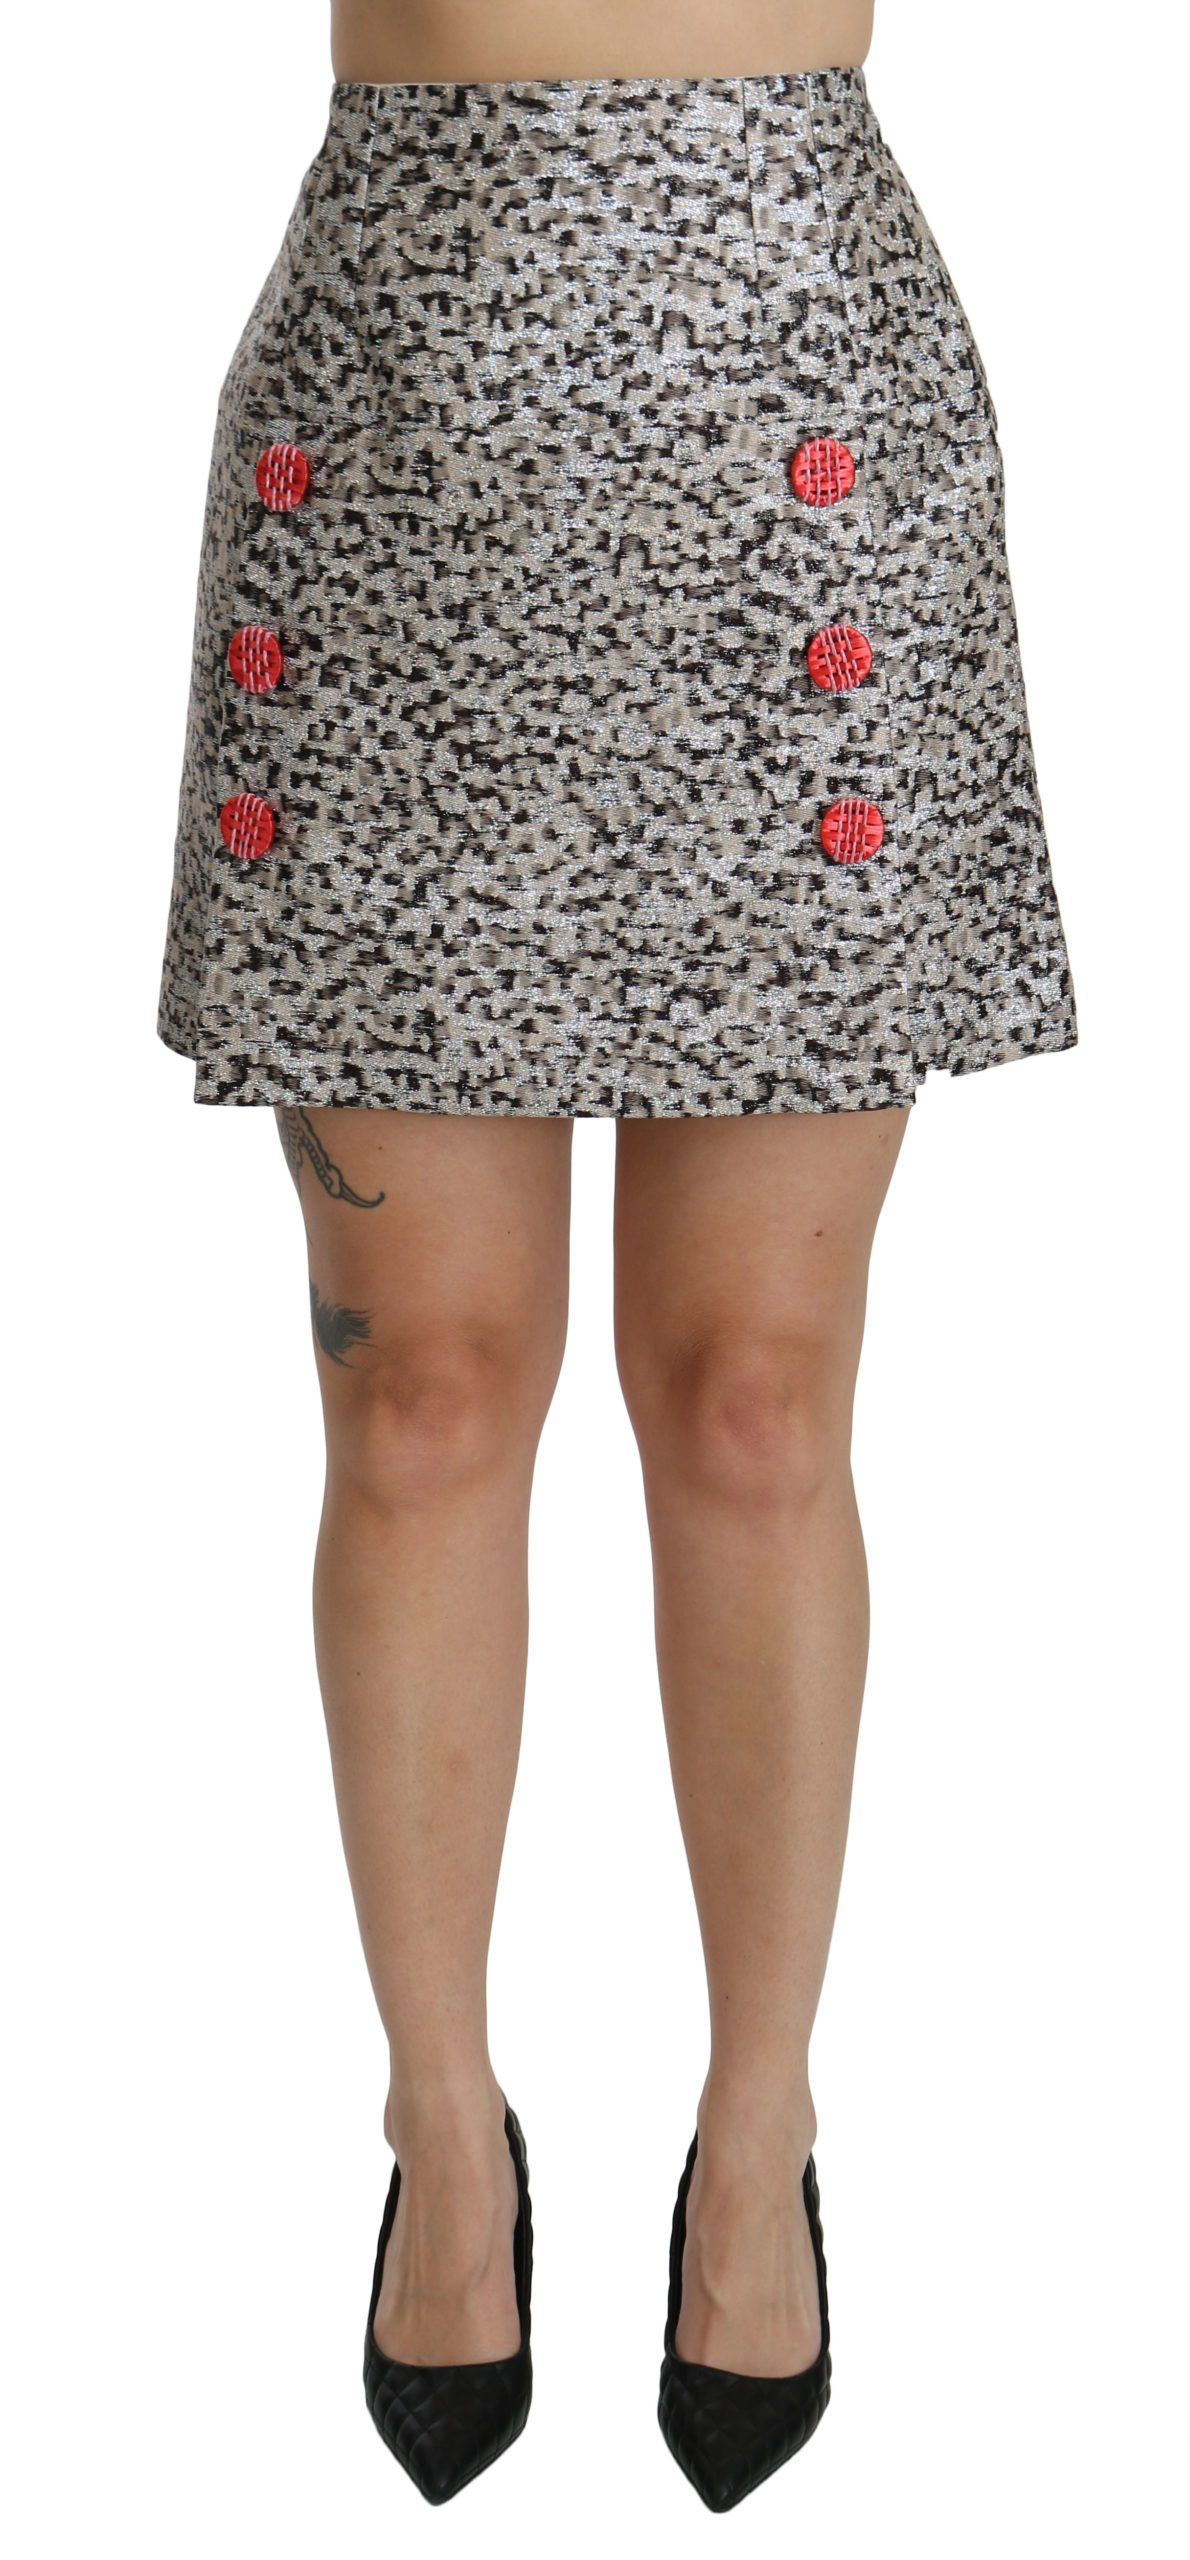 Dolce & Gabbana Women's Pattern A-line High Waist Skirt Black SKI1358 - IT36 | XS